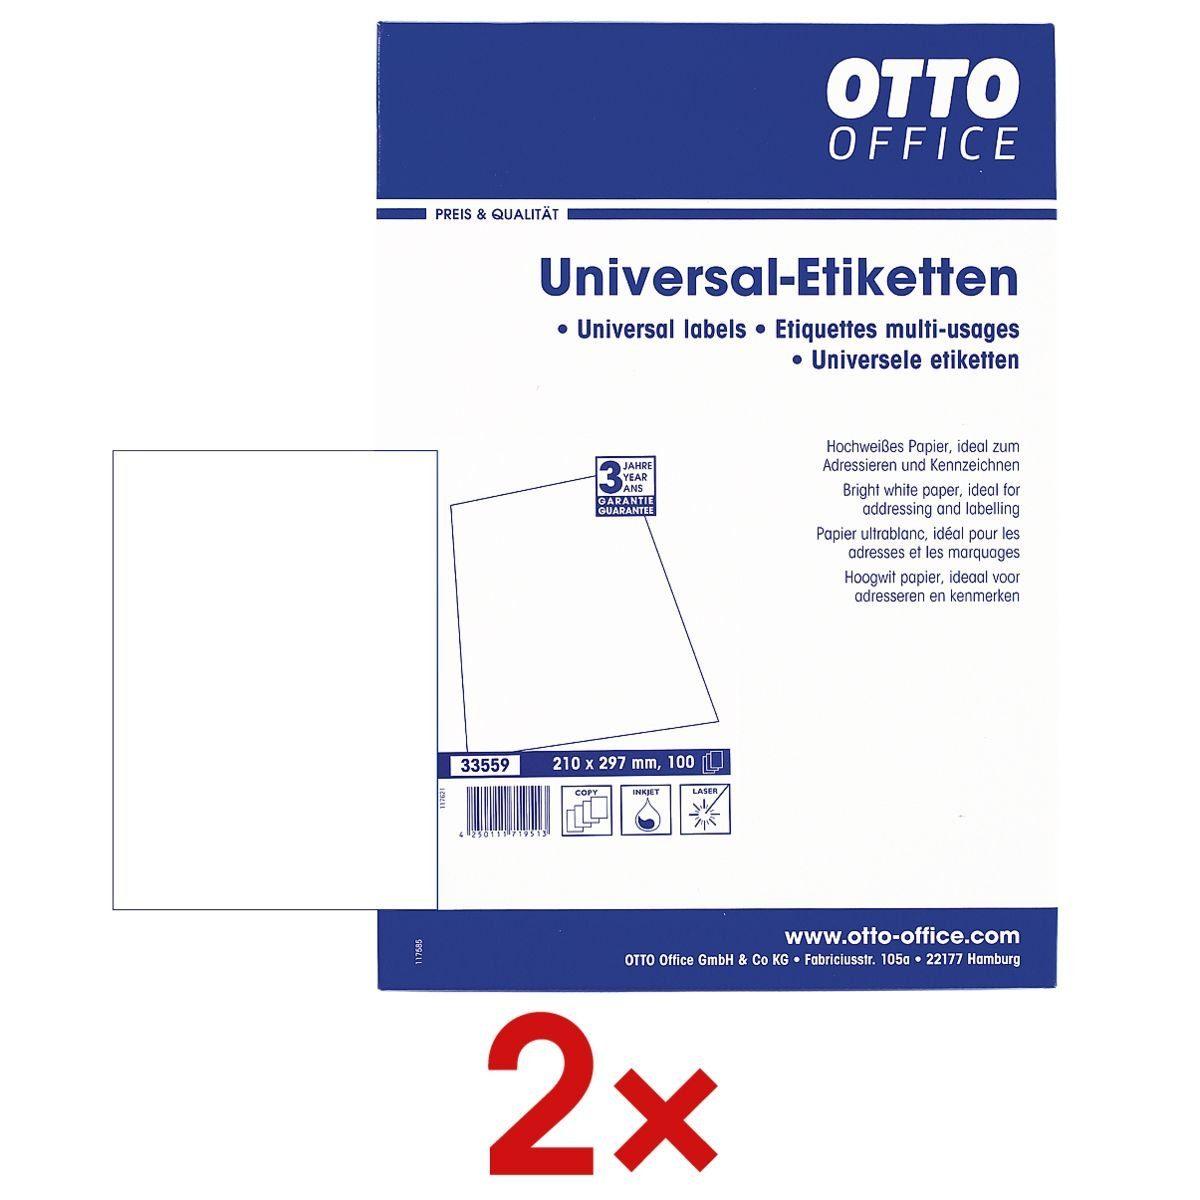 OTTO Office Standard 2x 100er-Pack Universal Klebeetiketten 1 Set